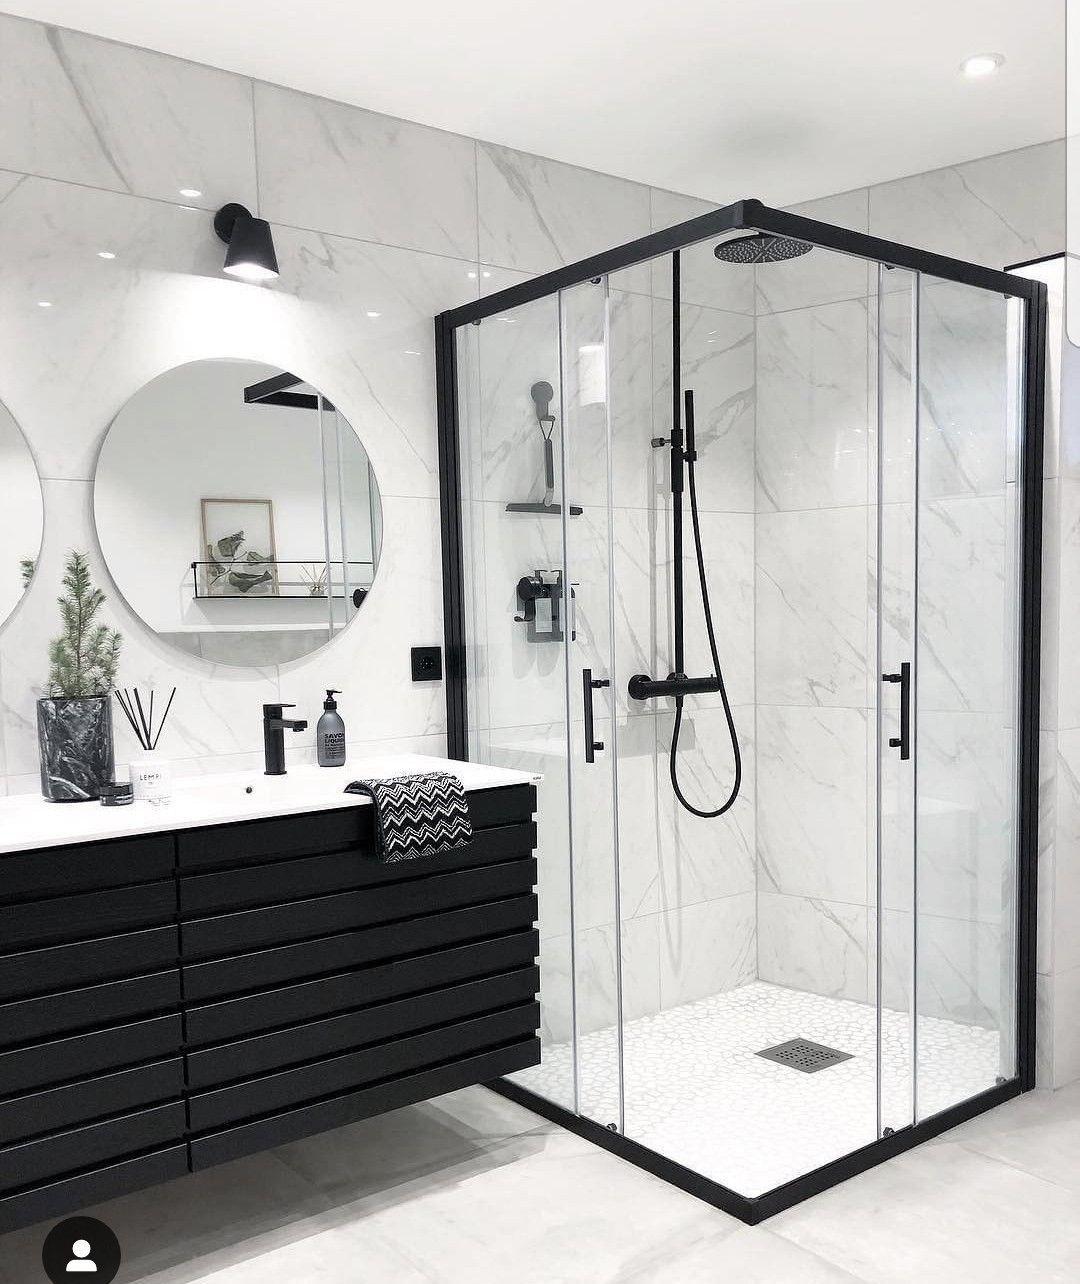 Modern Black And White Modern Luxury Bathroom Elegant Bathroom Design Bathroom Interior Design